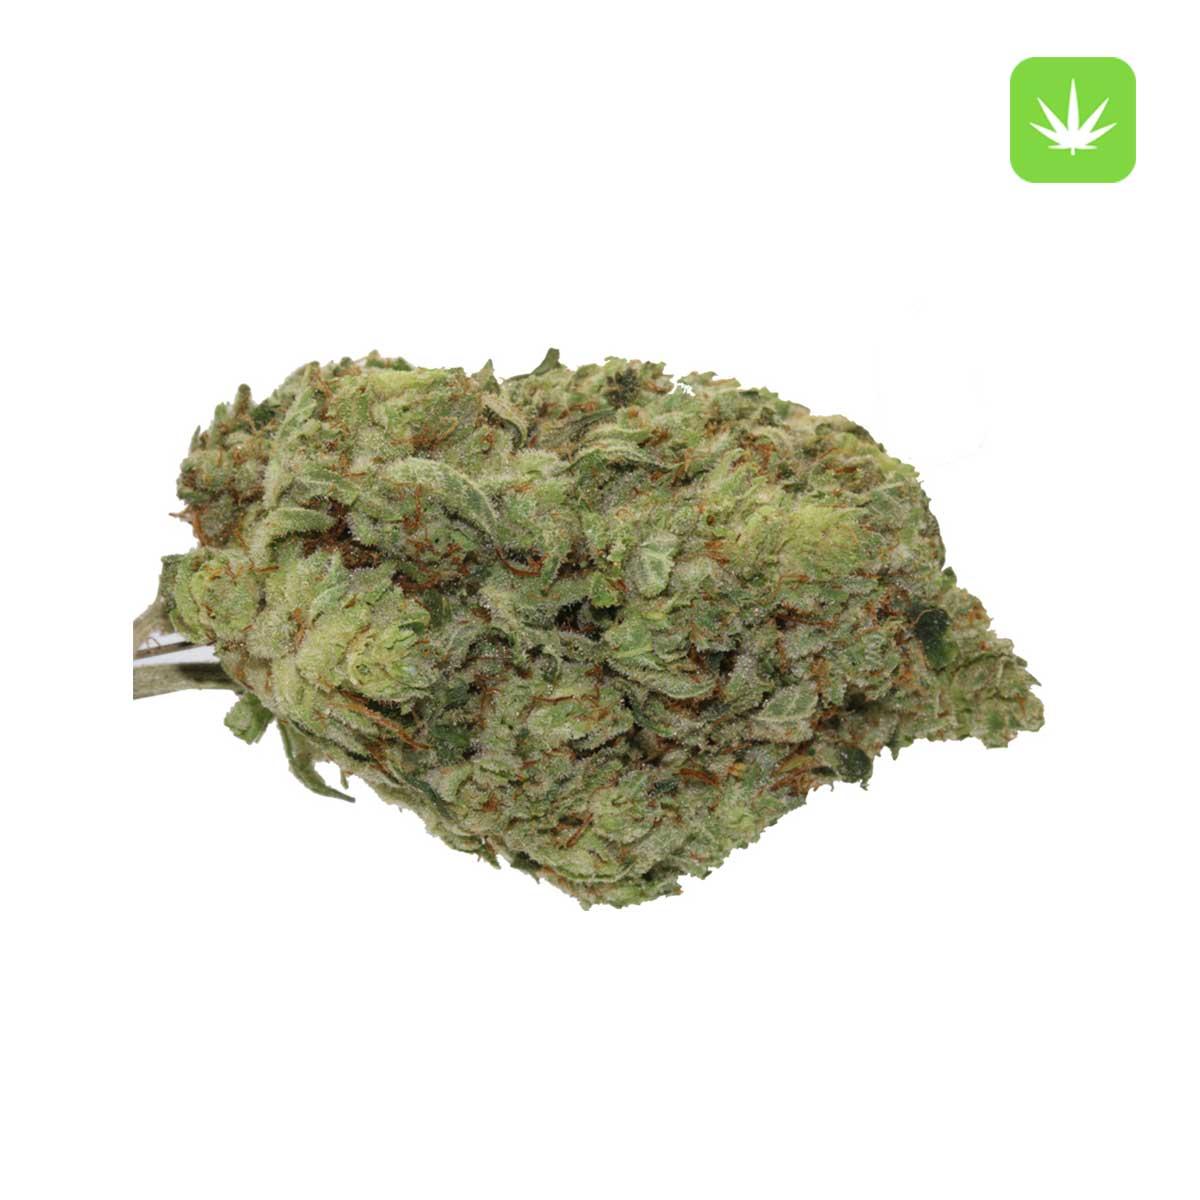 Gorilla Glue Cannabis Avenue 1